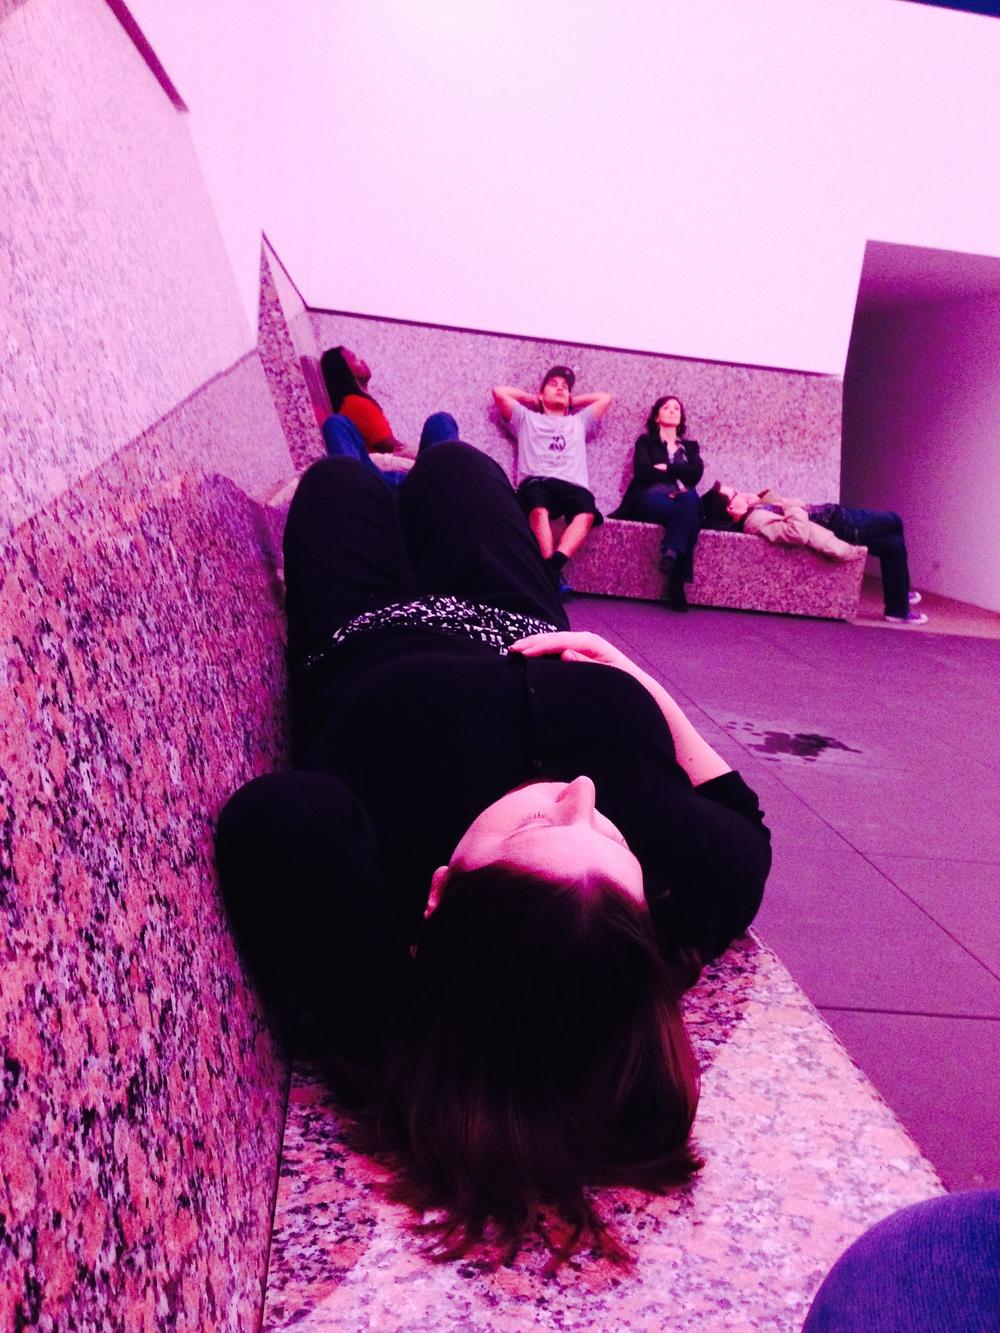 Emily experiencing exhibition